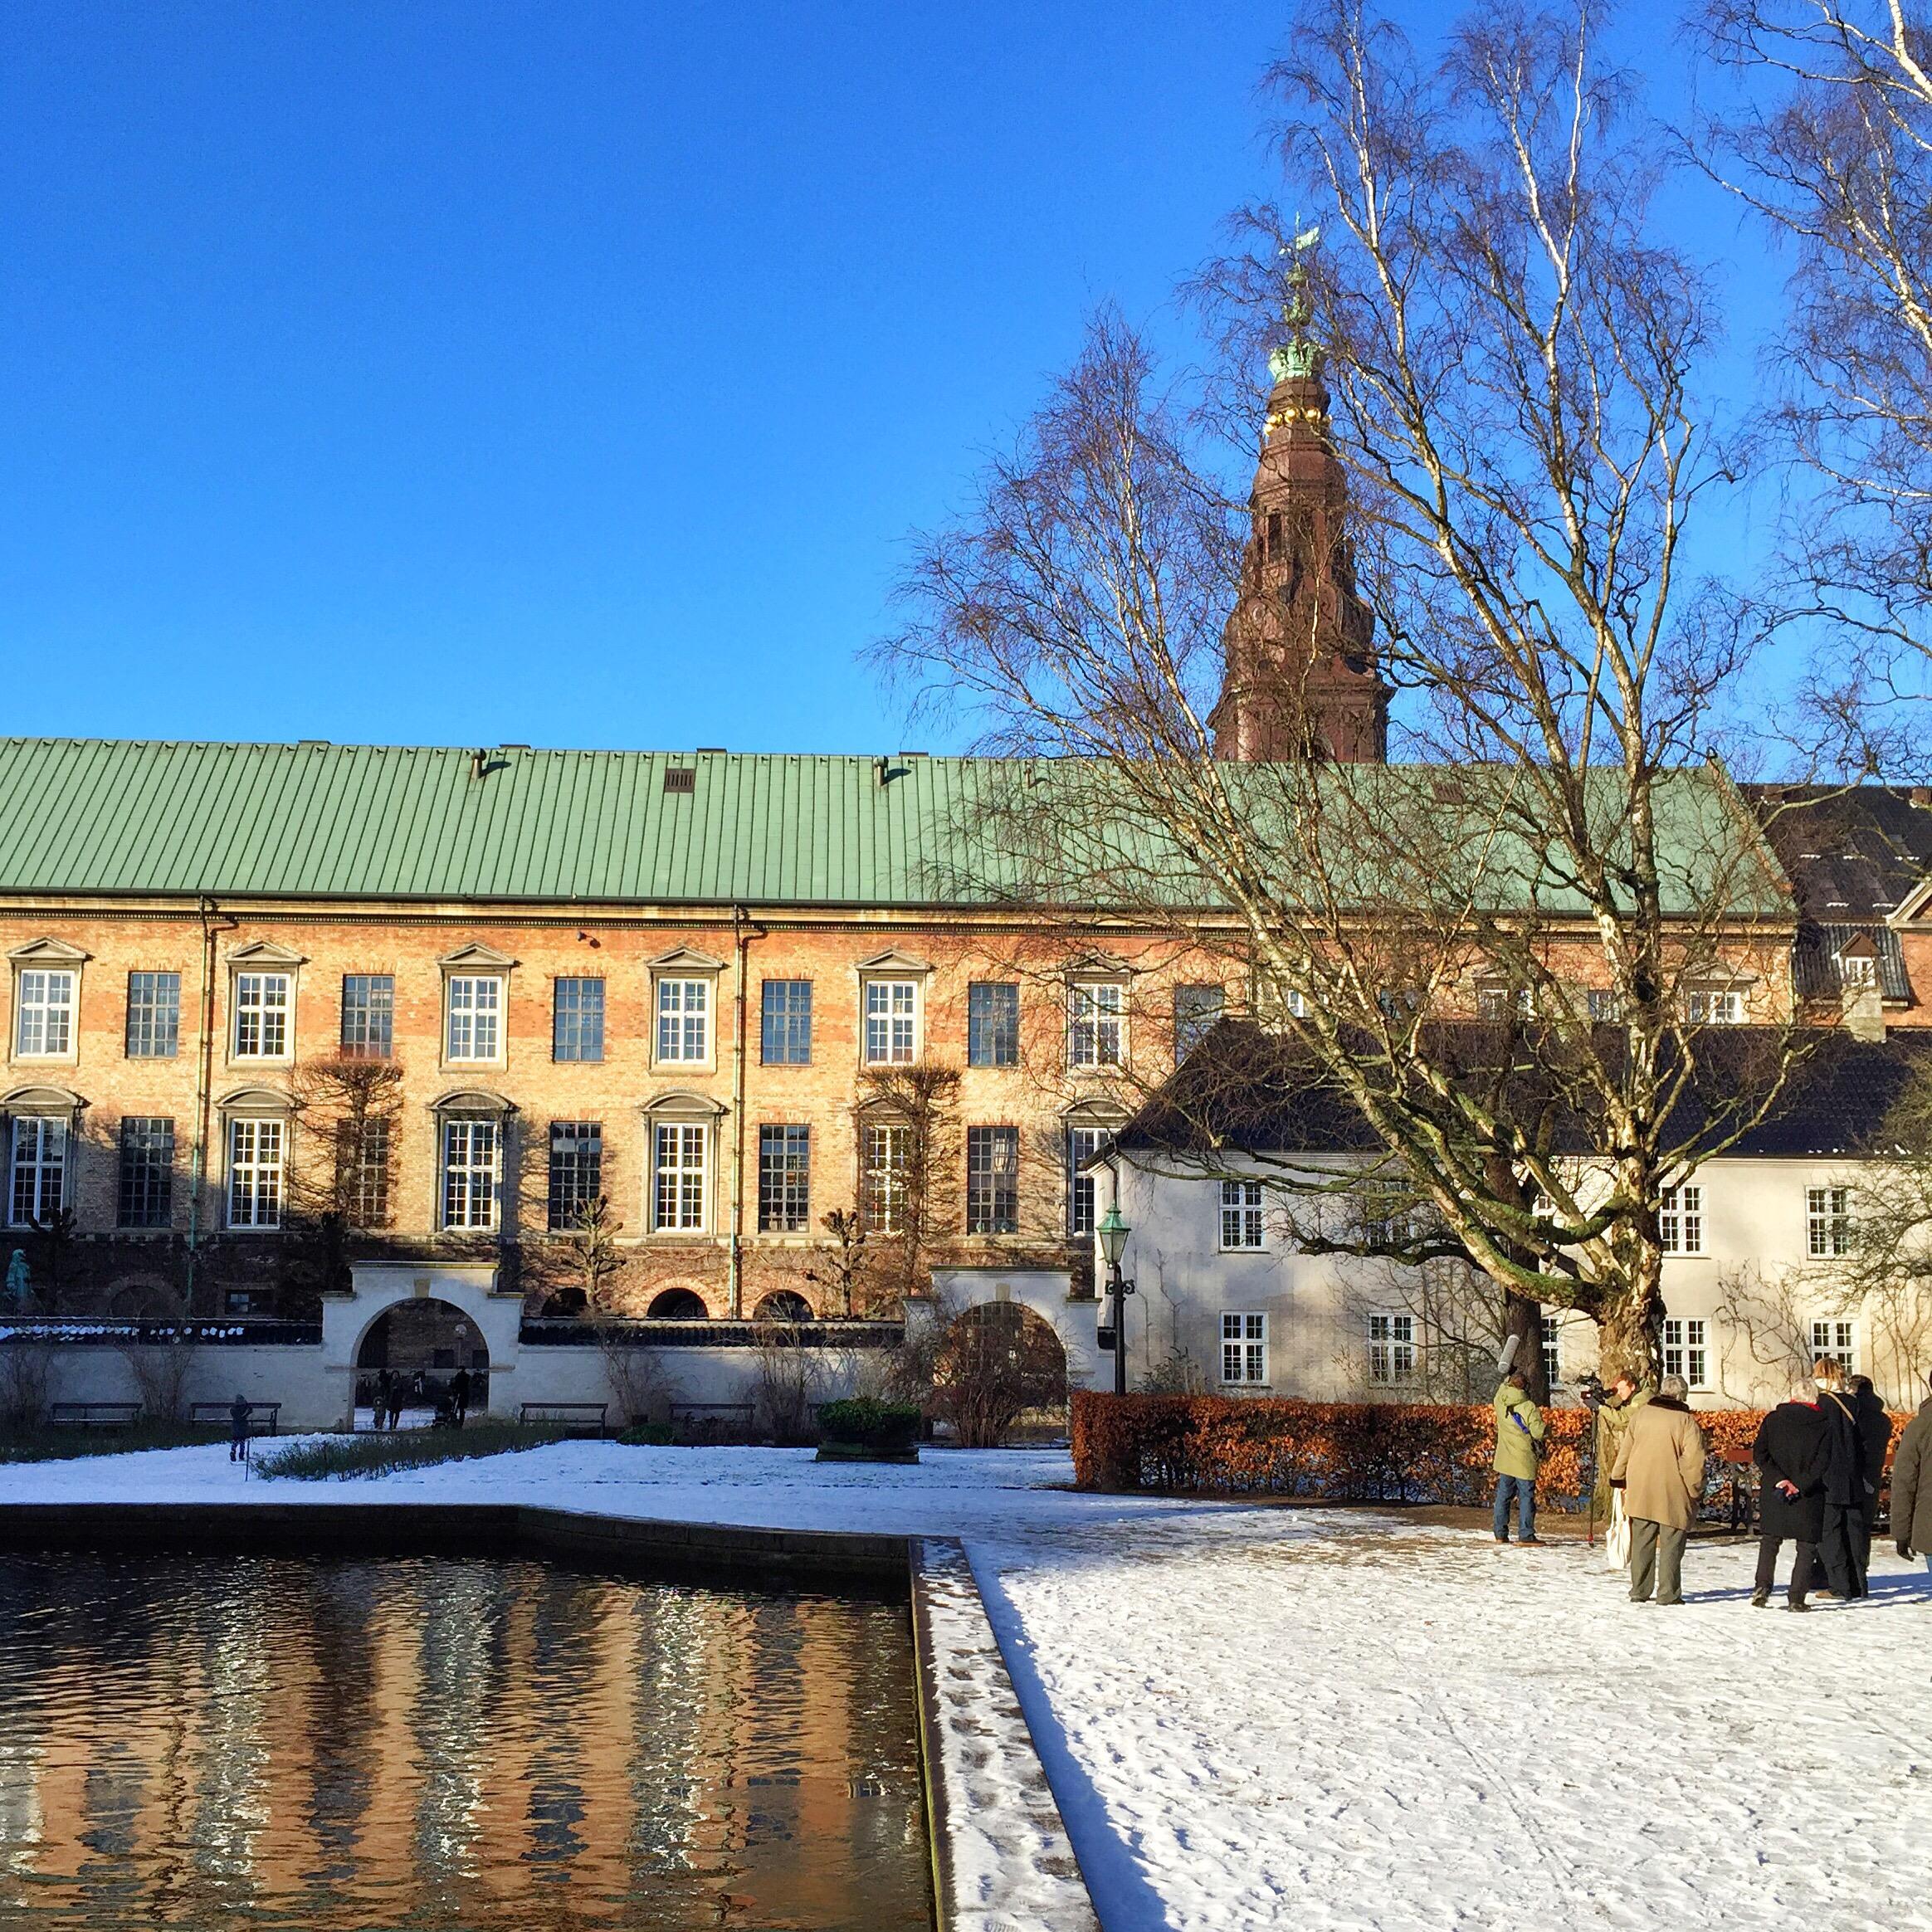 Smukke Christiansborg!